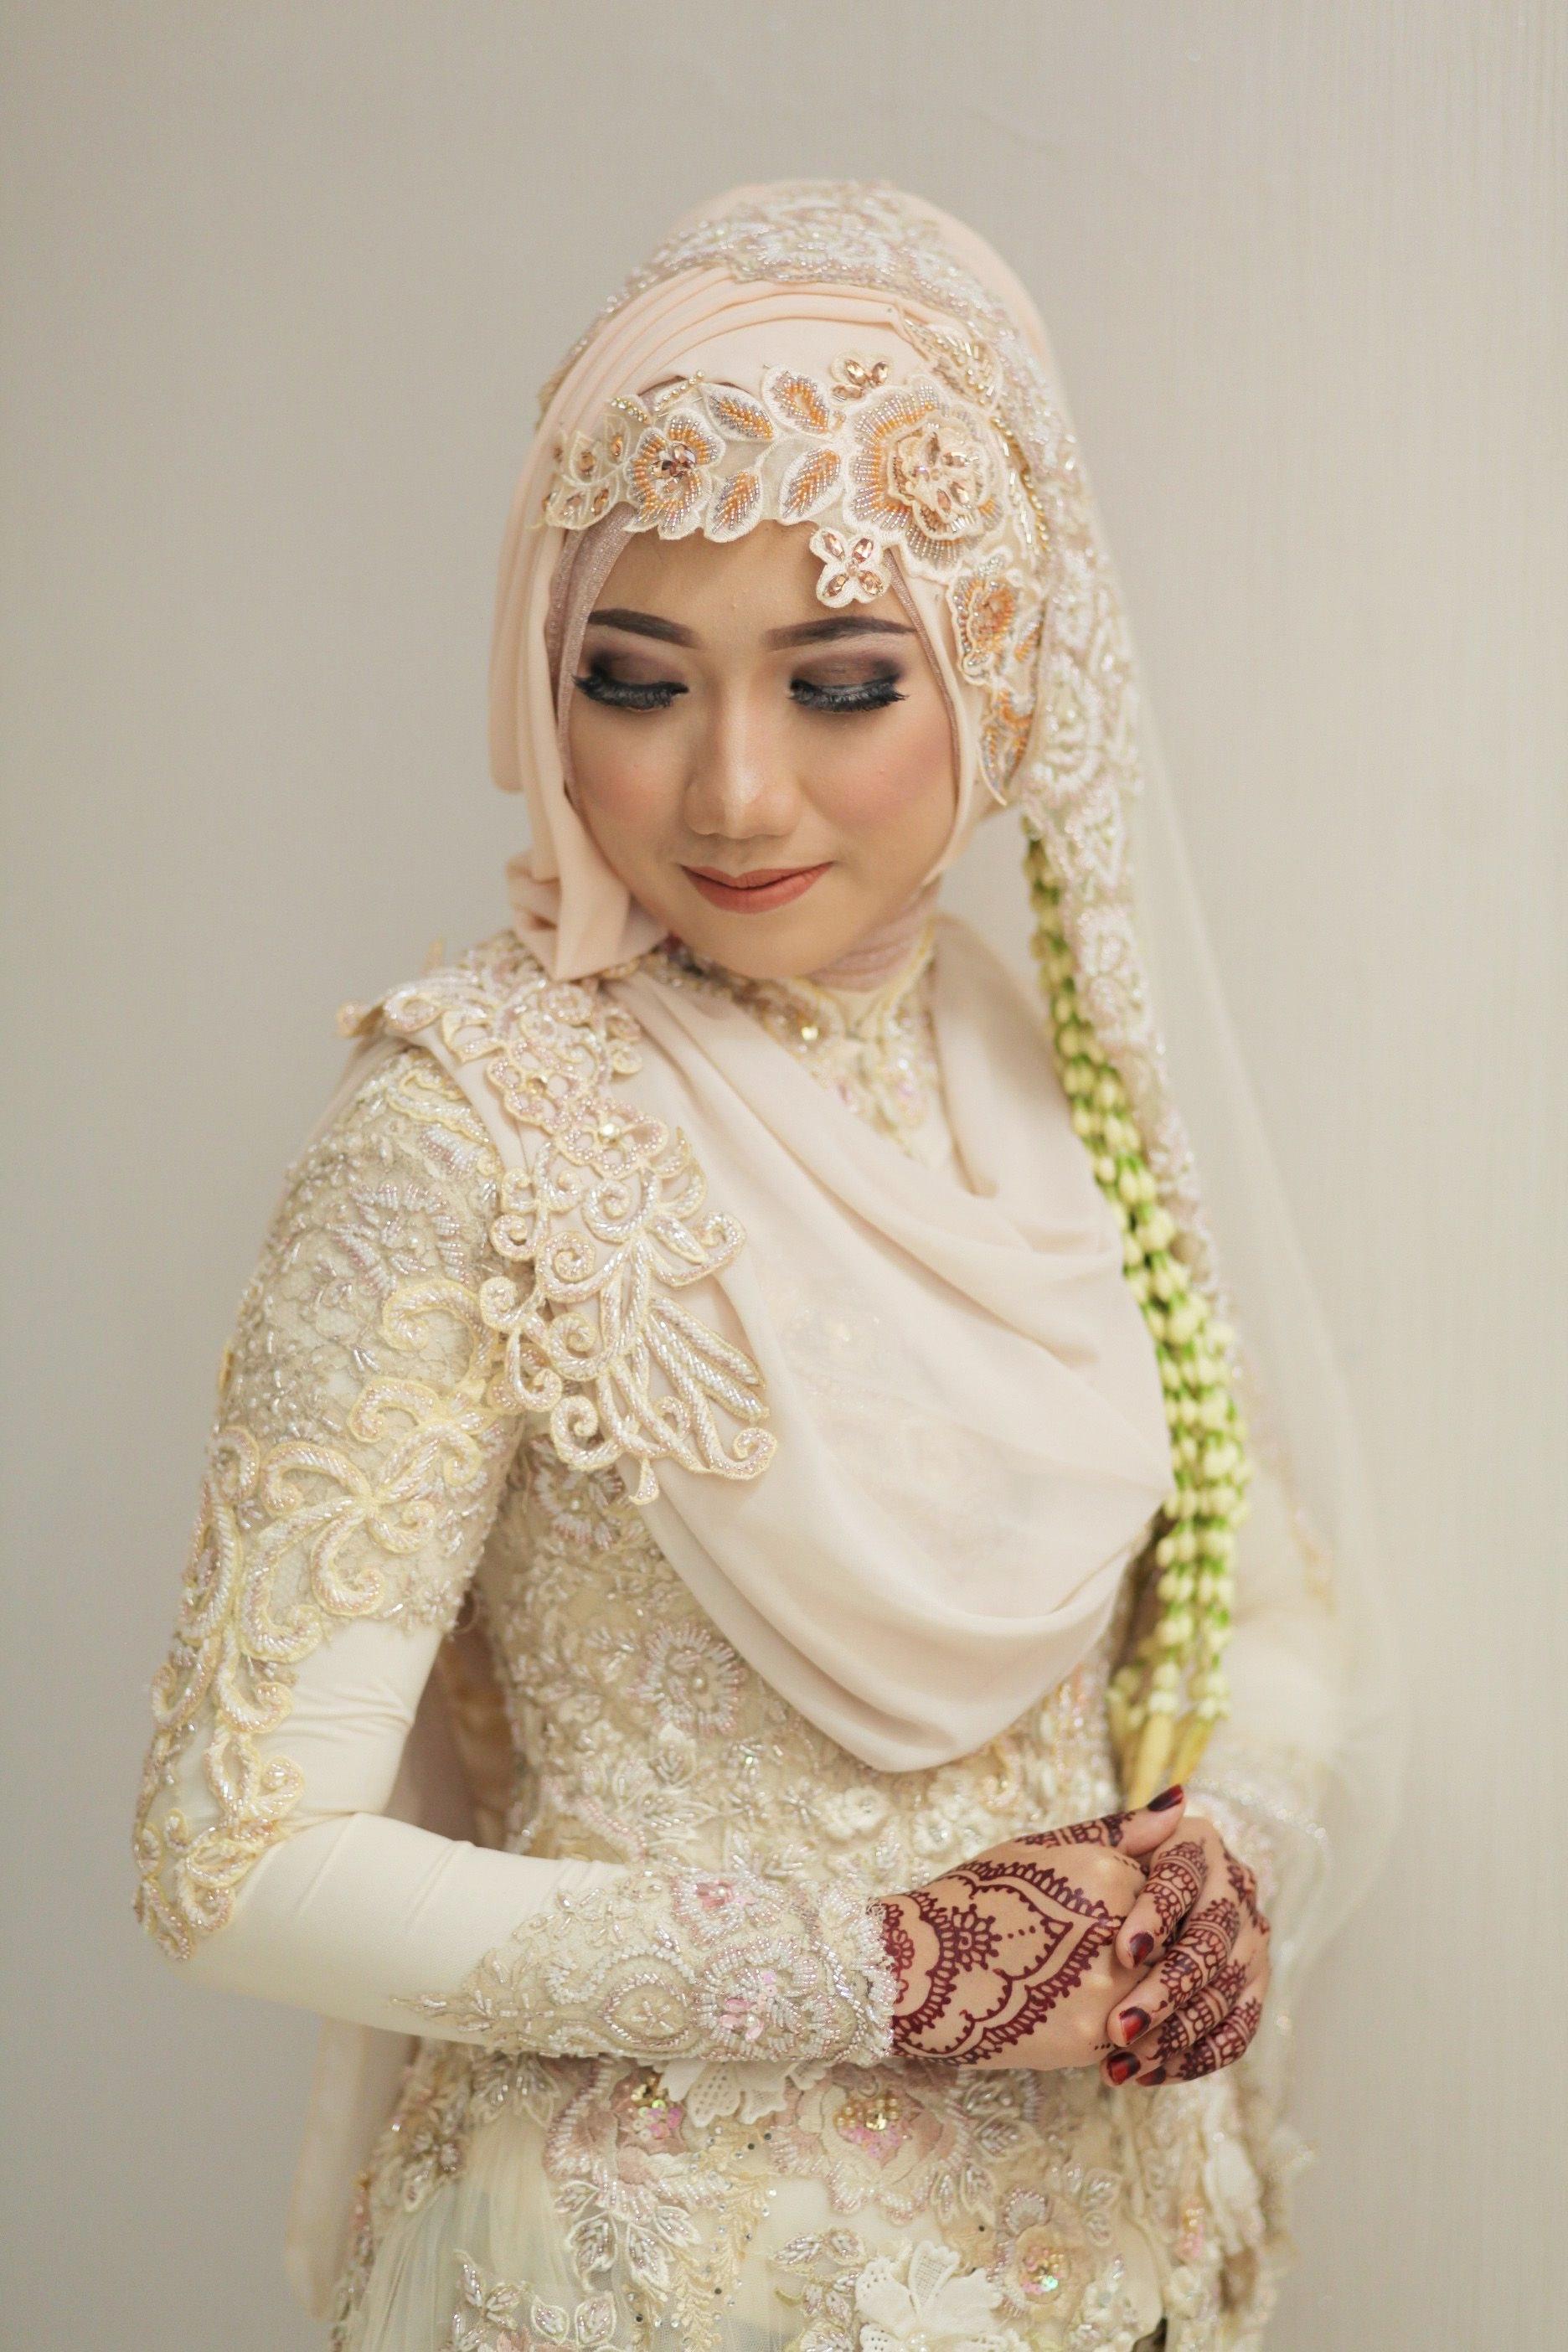 Model Gaun Pengiring Pengantin Muslim Dwdk Awalia Nofitasari Awalianofitasar On Pinterest